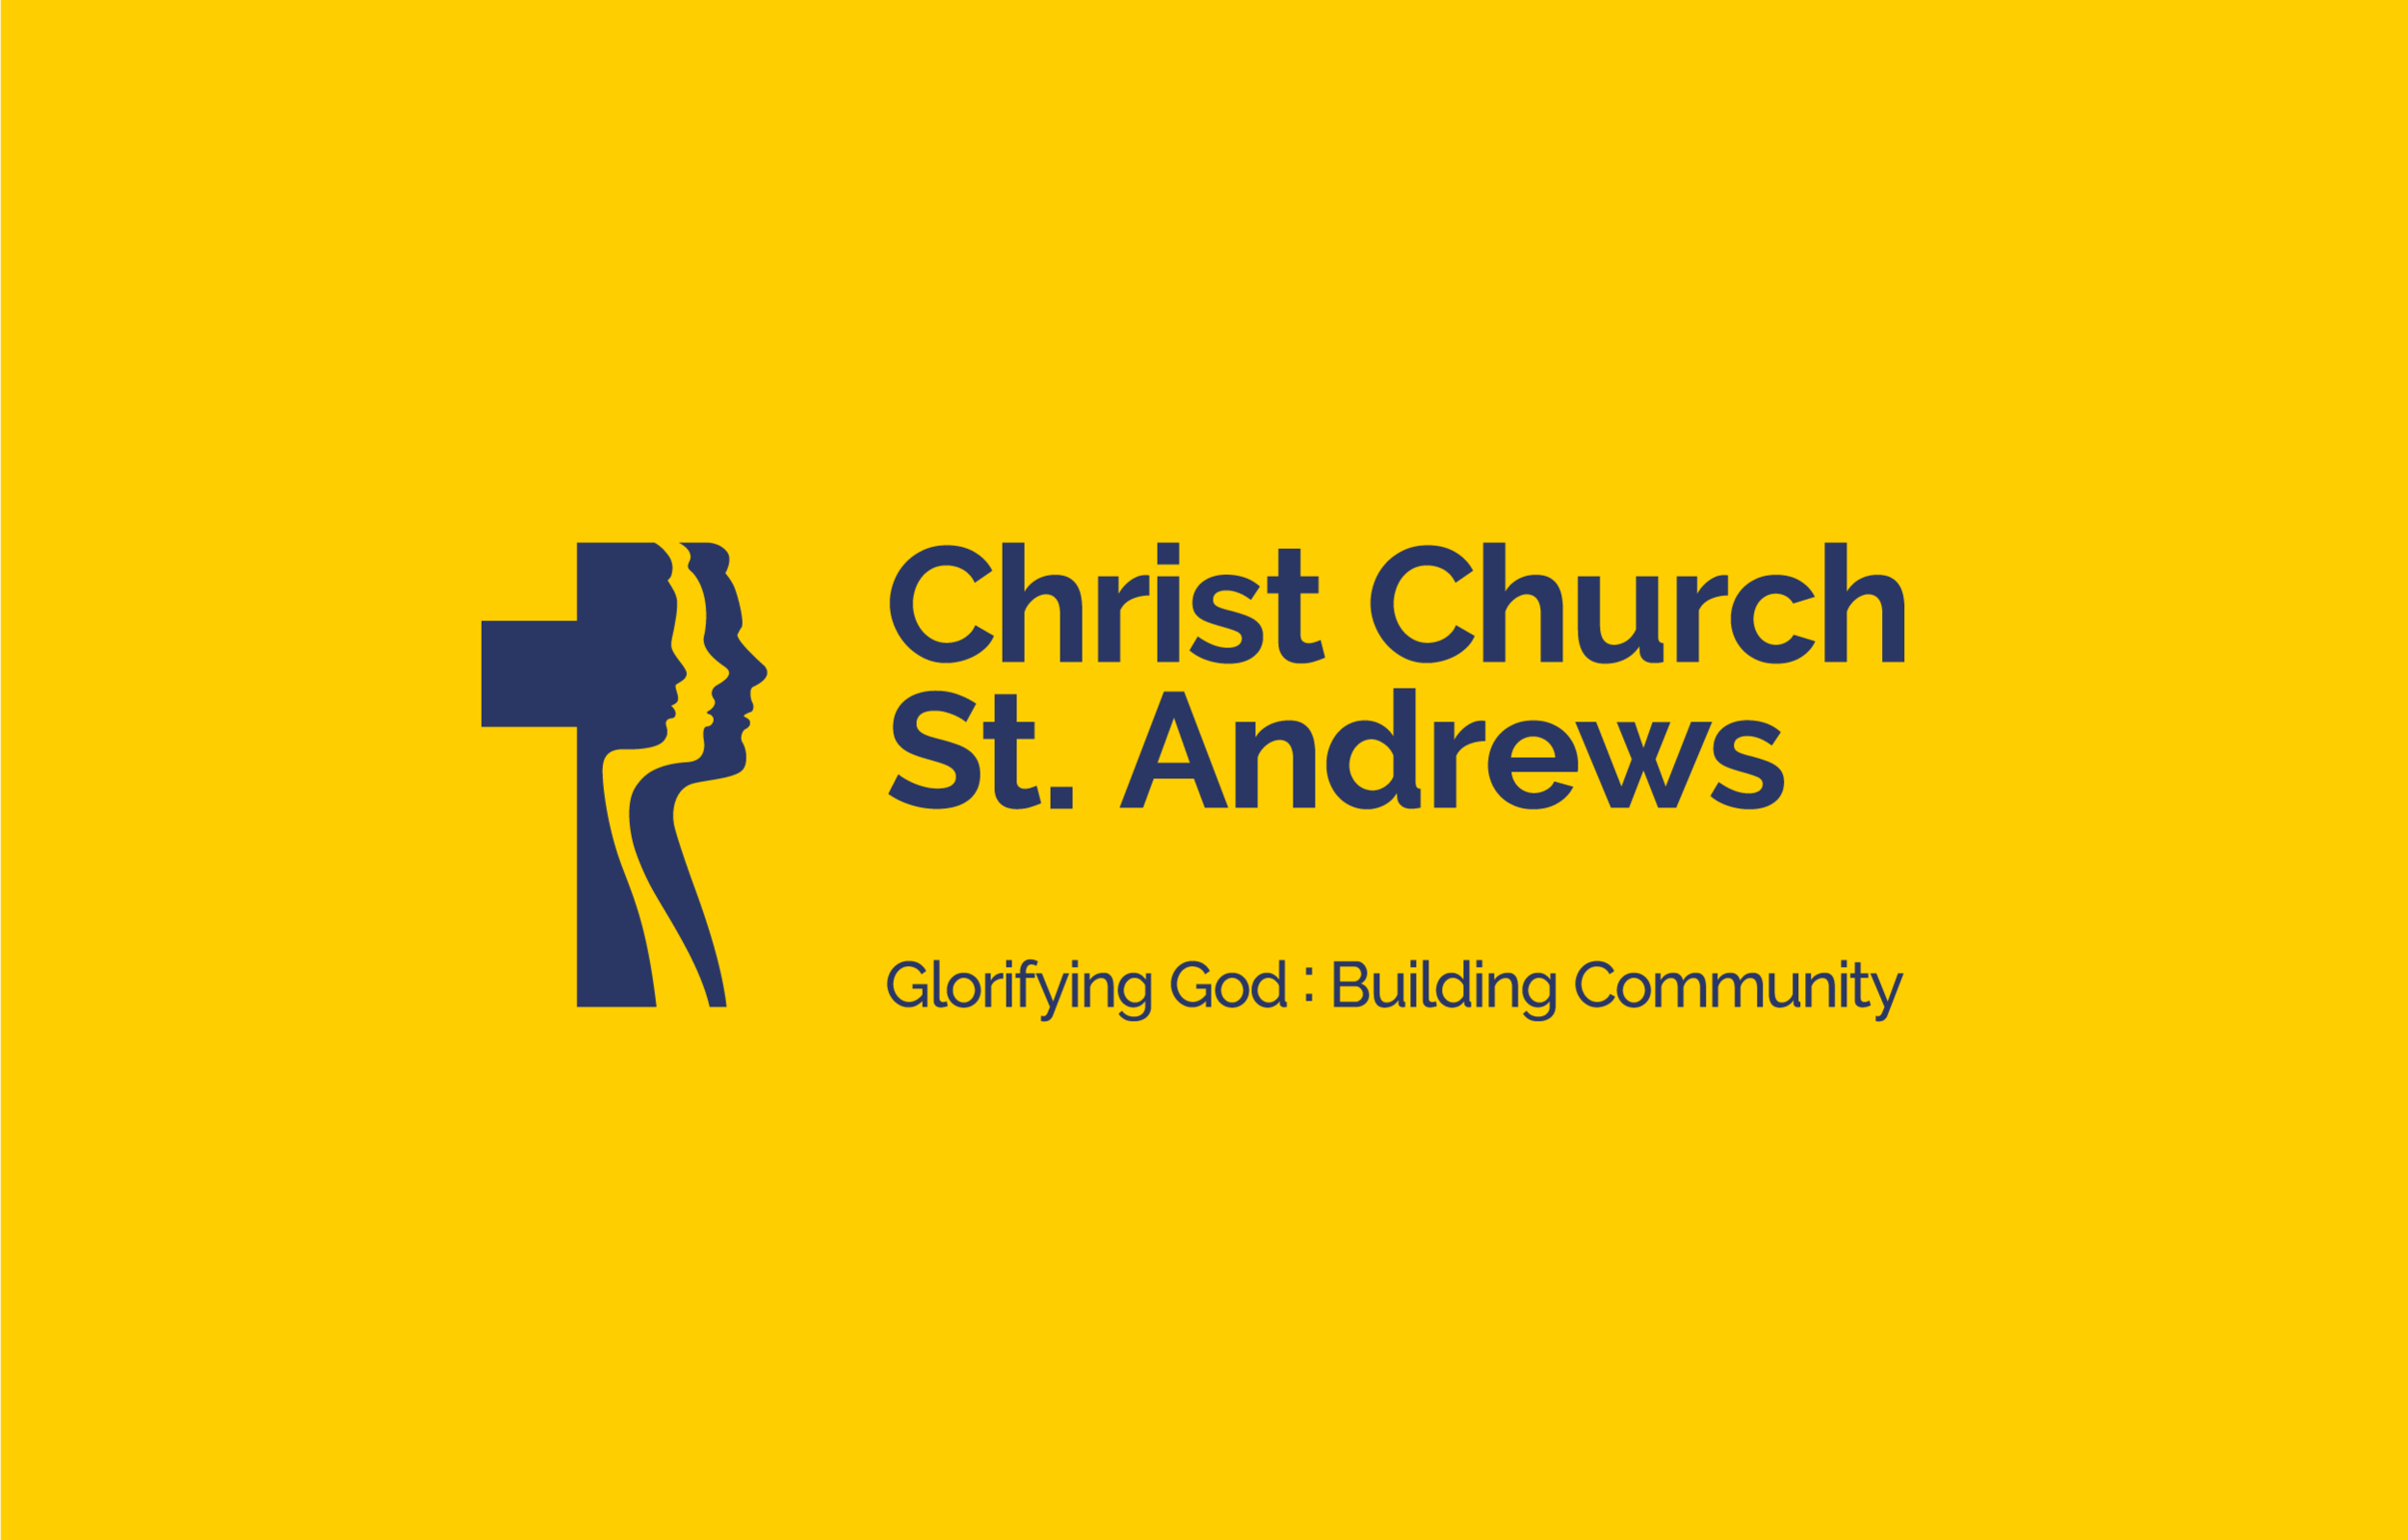 Chrischurch-Church-Herne-Bay-Rebrand-Logo.png